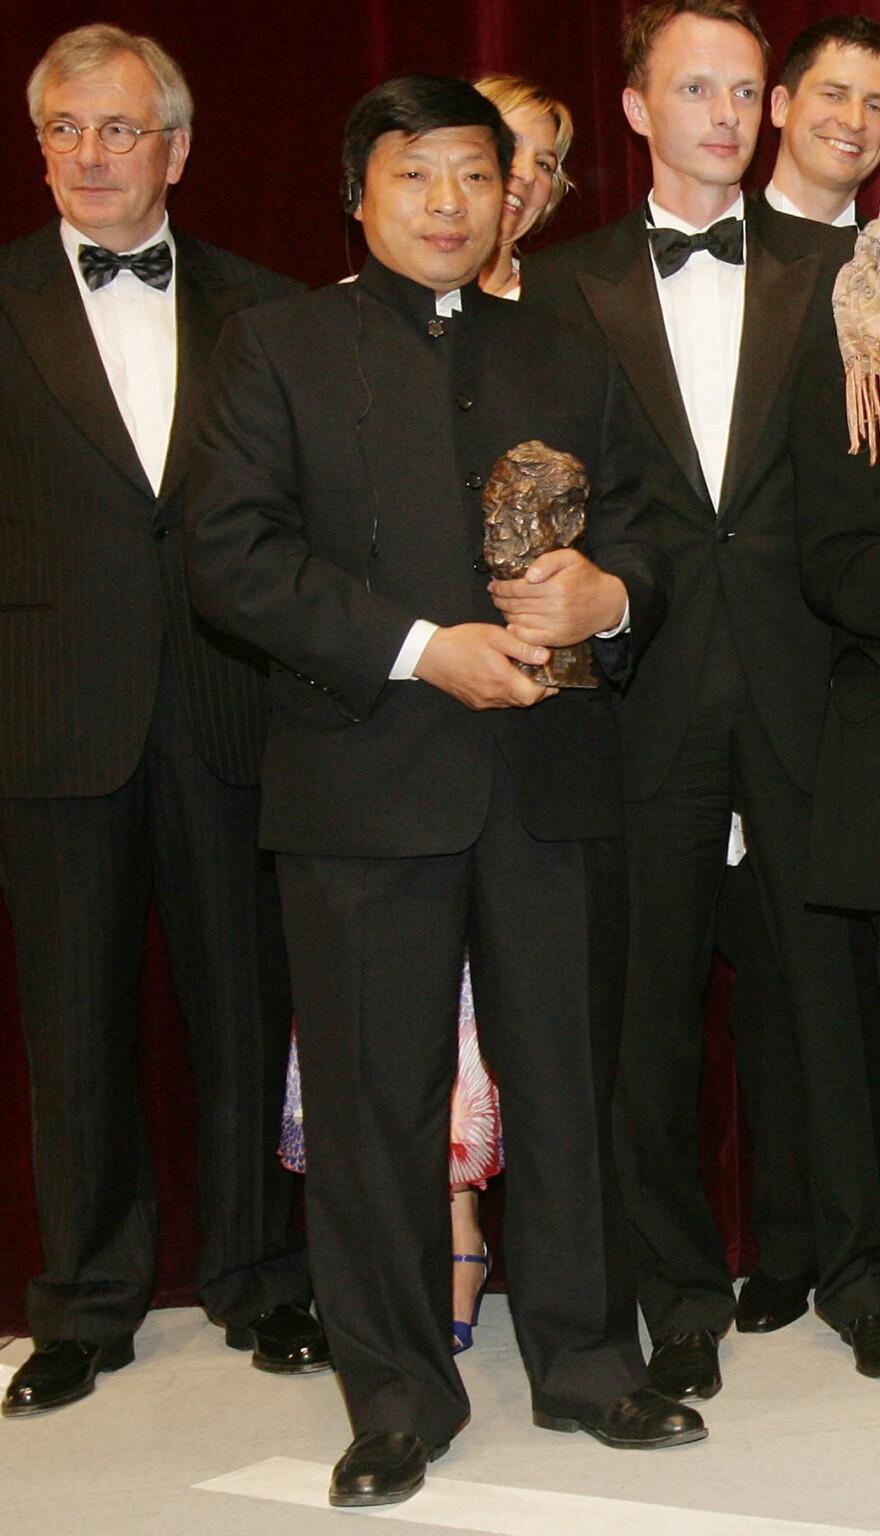 Lu Guang holding his Henri Nannen Award in 2008 in Hamburg, Germany.